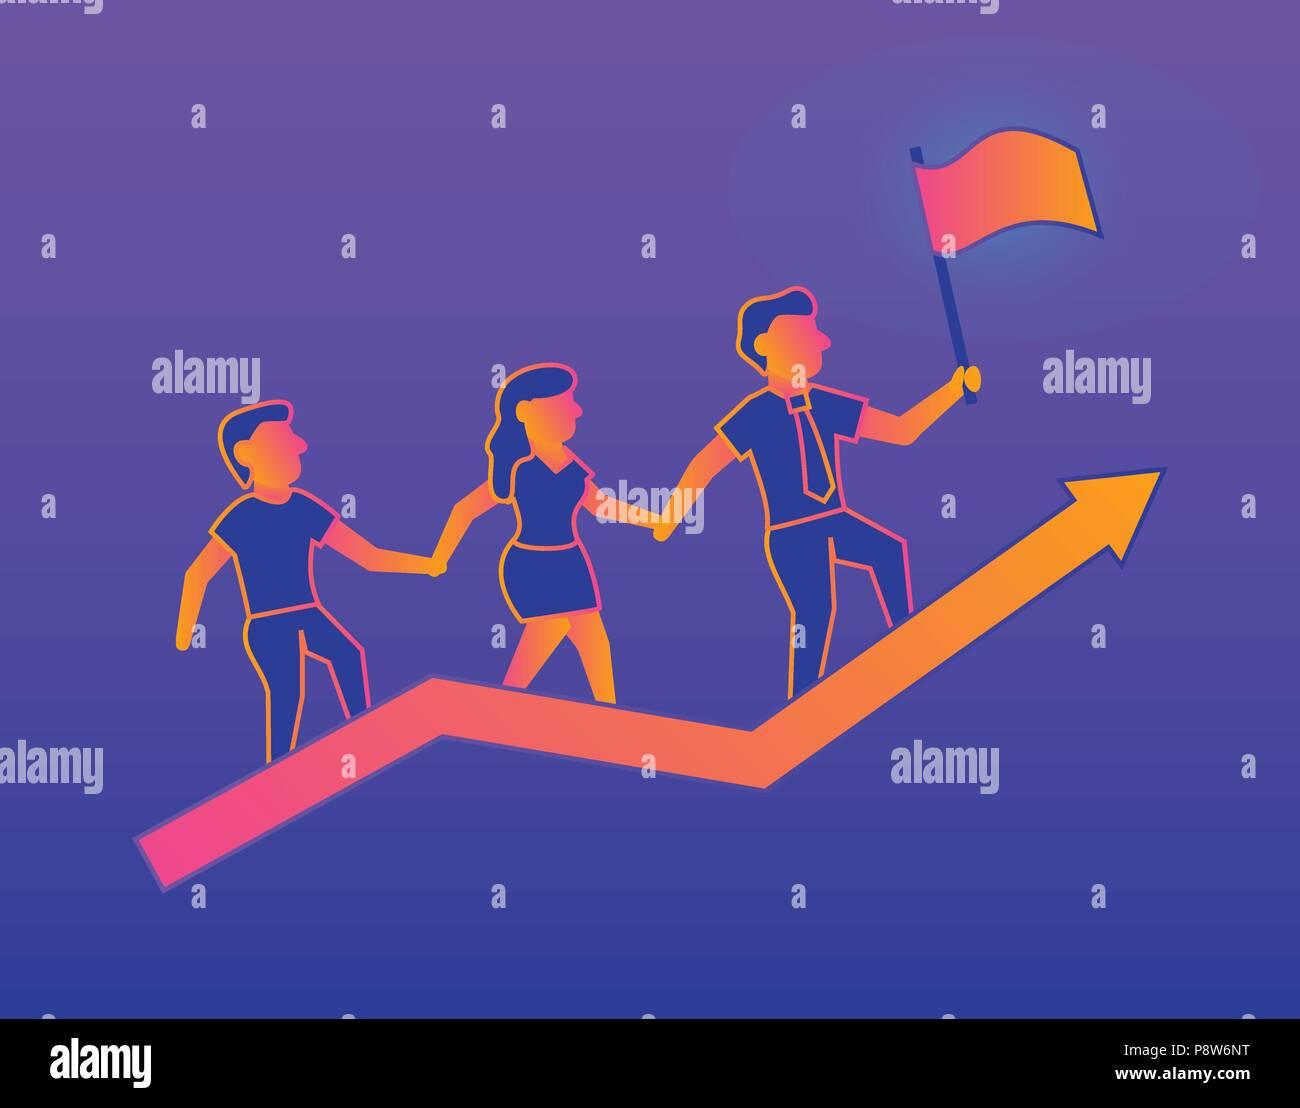 Success Gradient illustration on violet background - Stock Image